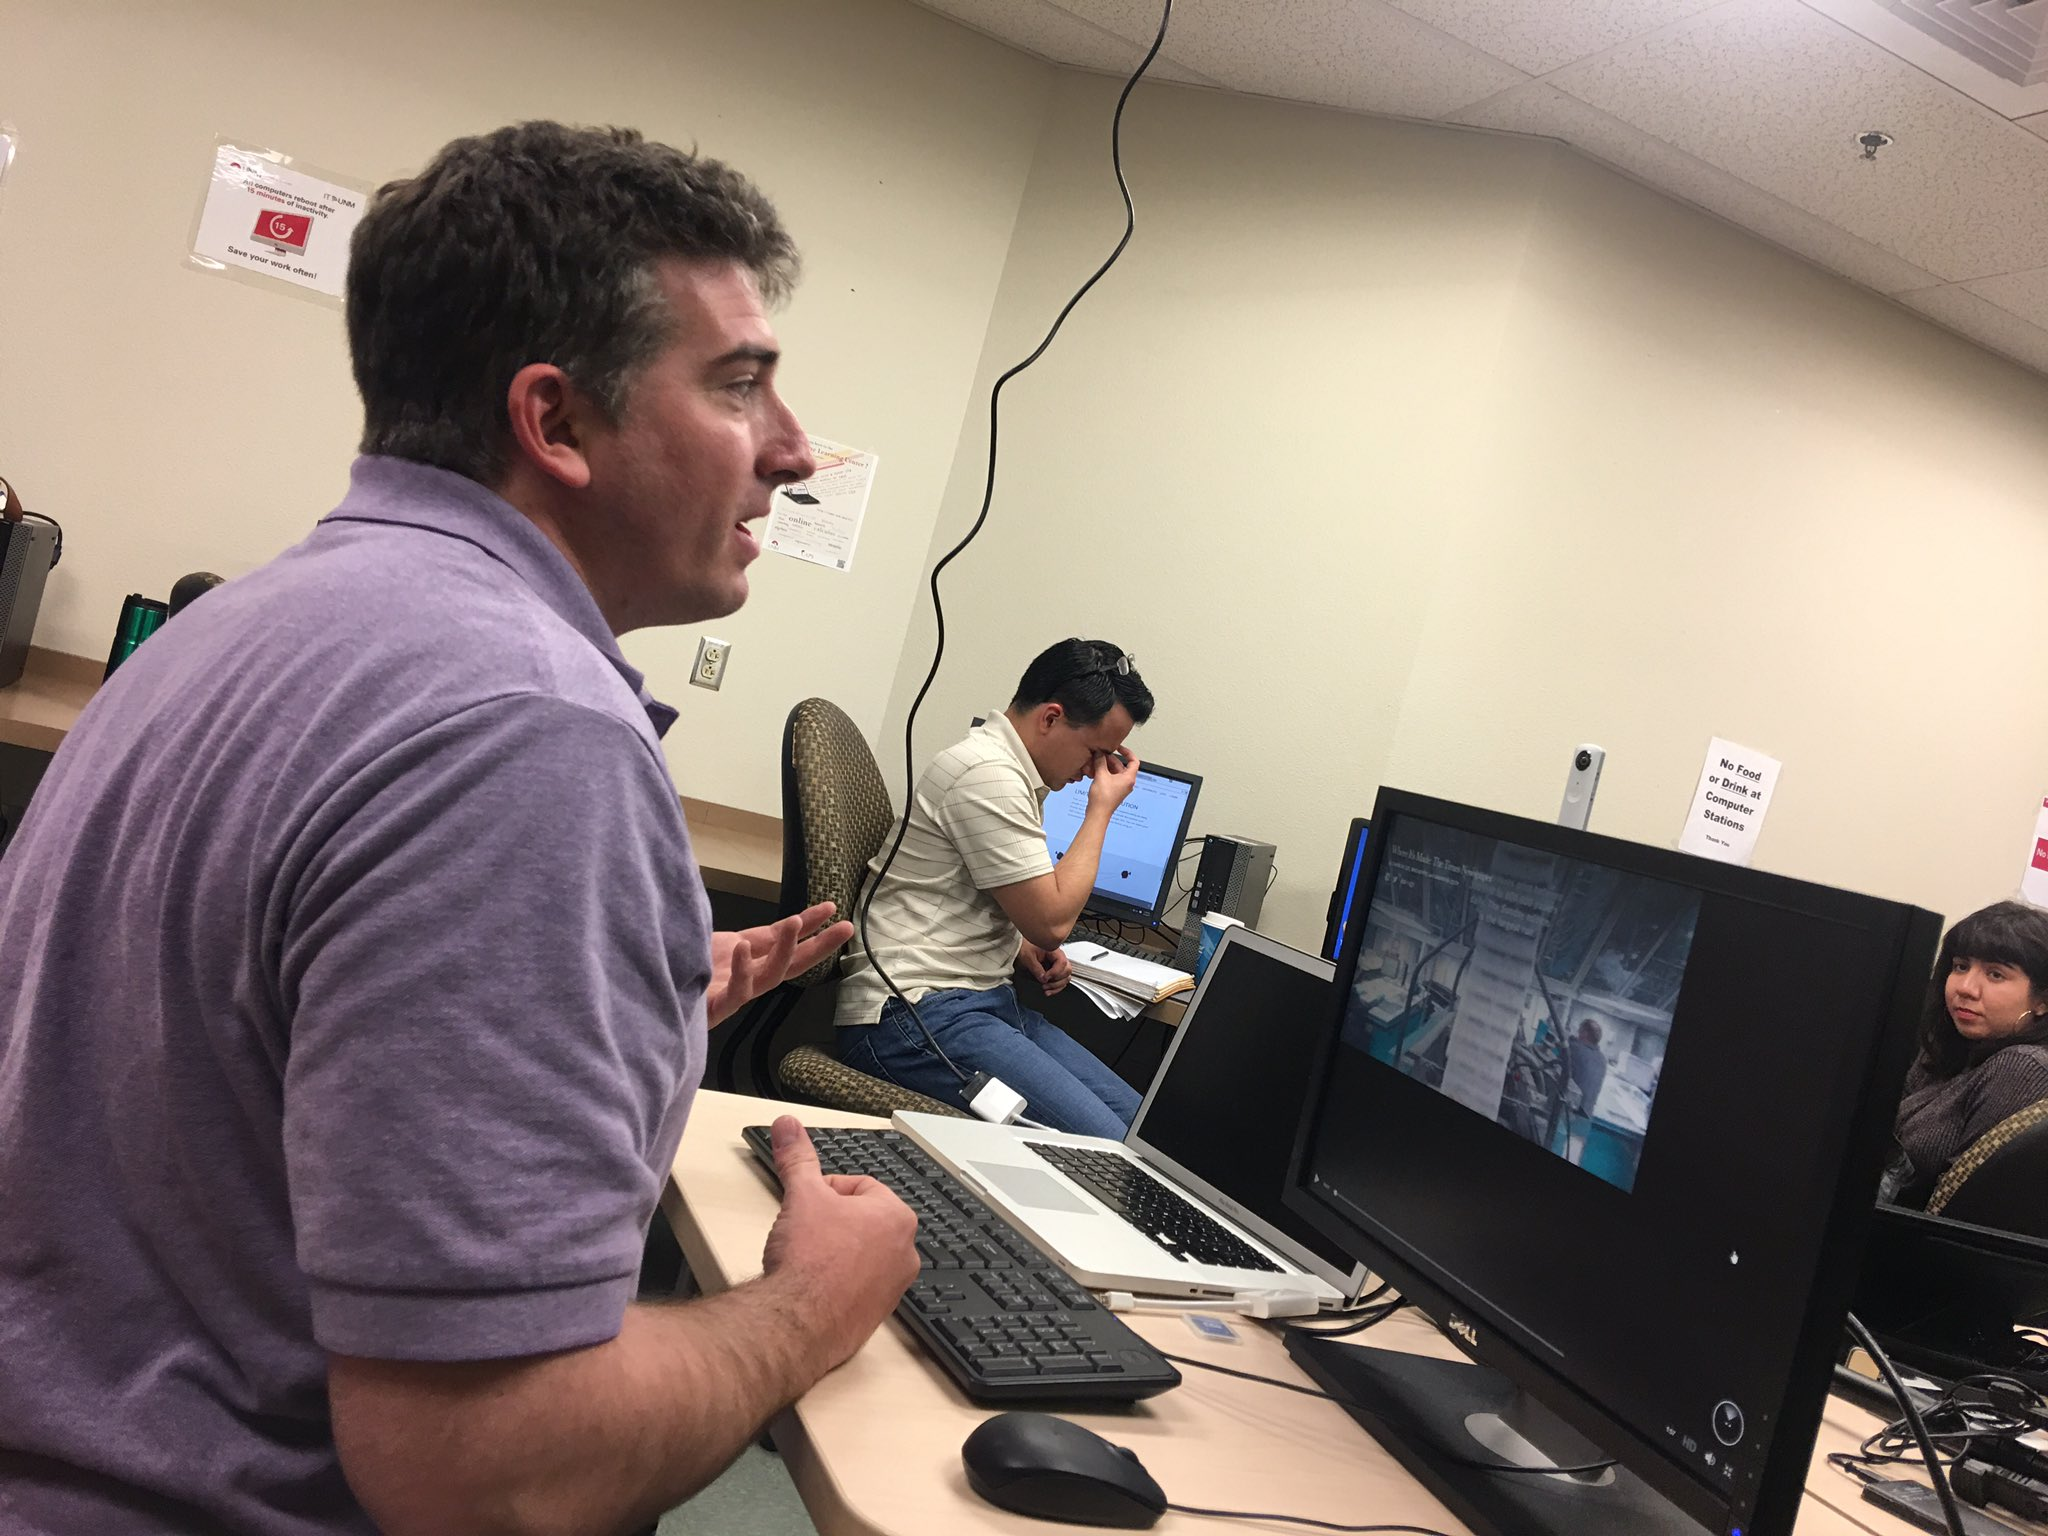 .@arvrus360 's Elan Colello giving UNM's #CJ375 an ex lanatipn of how #360video works. #multimedia #journalism https://t.co/QWmAGUe3YN